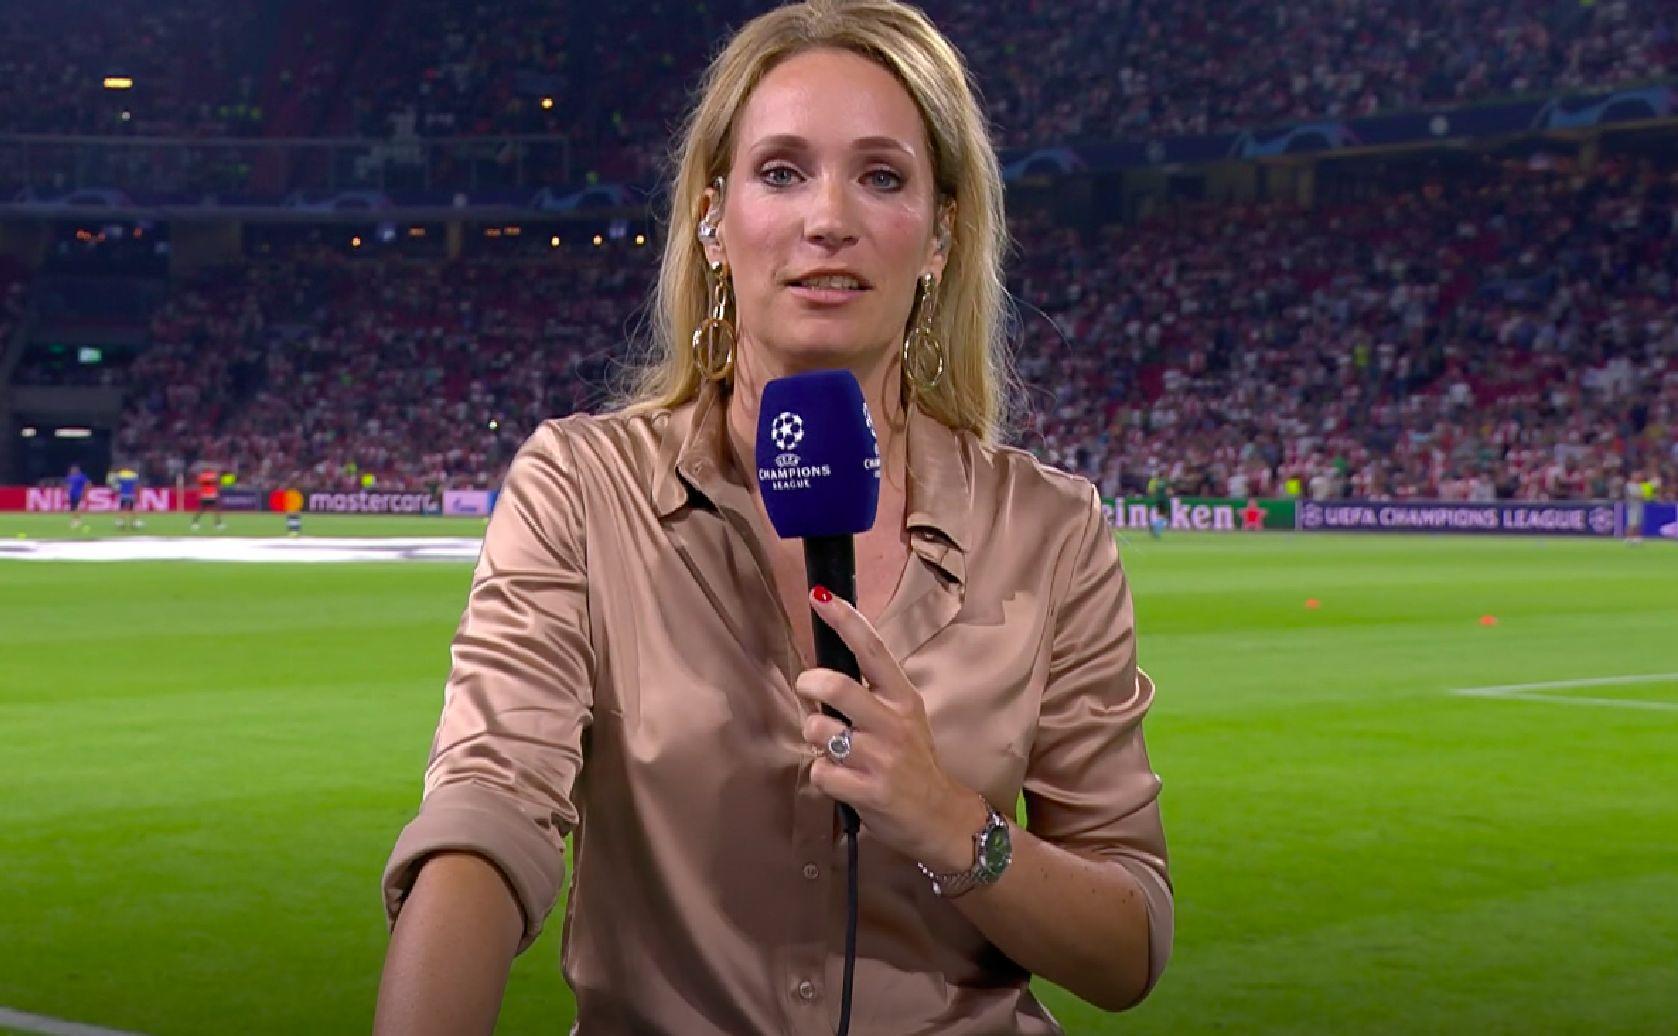 Helene Champions League